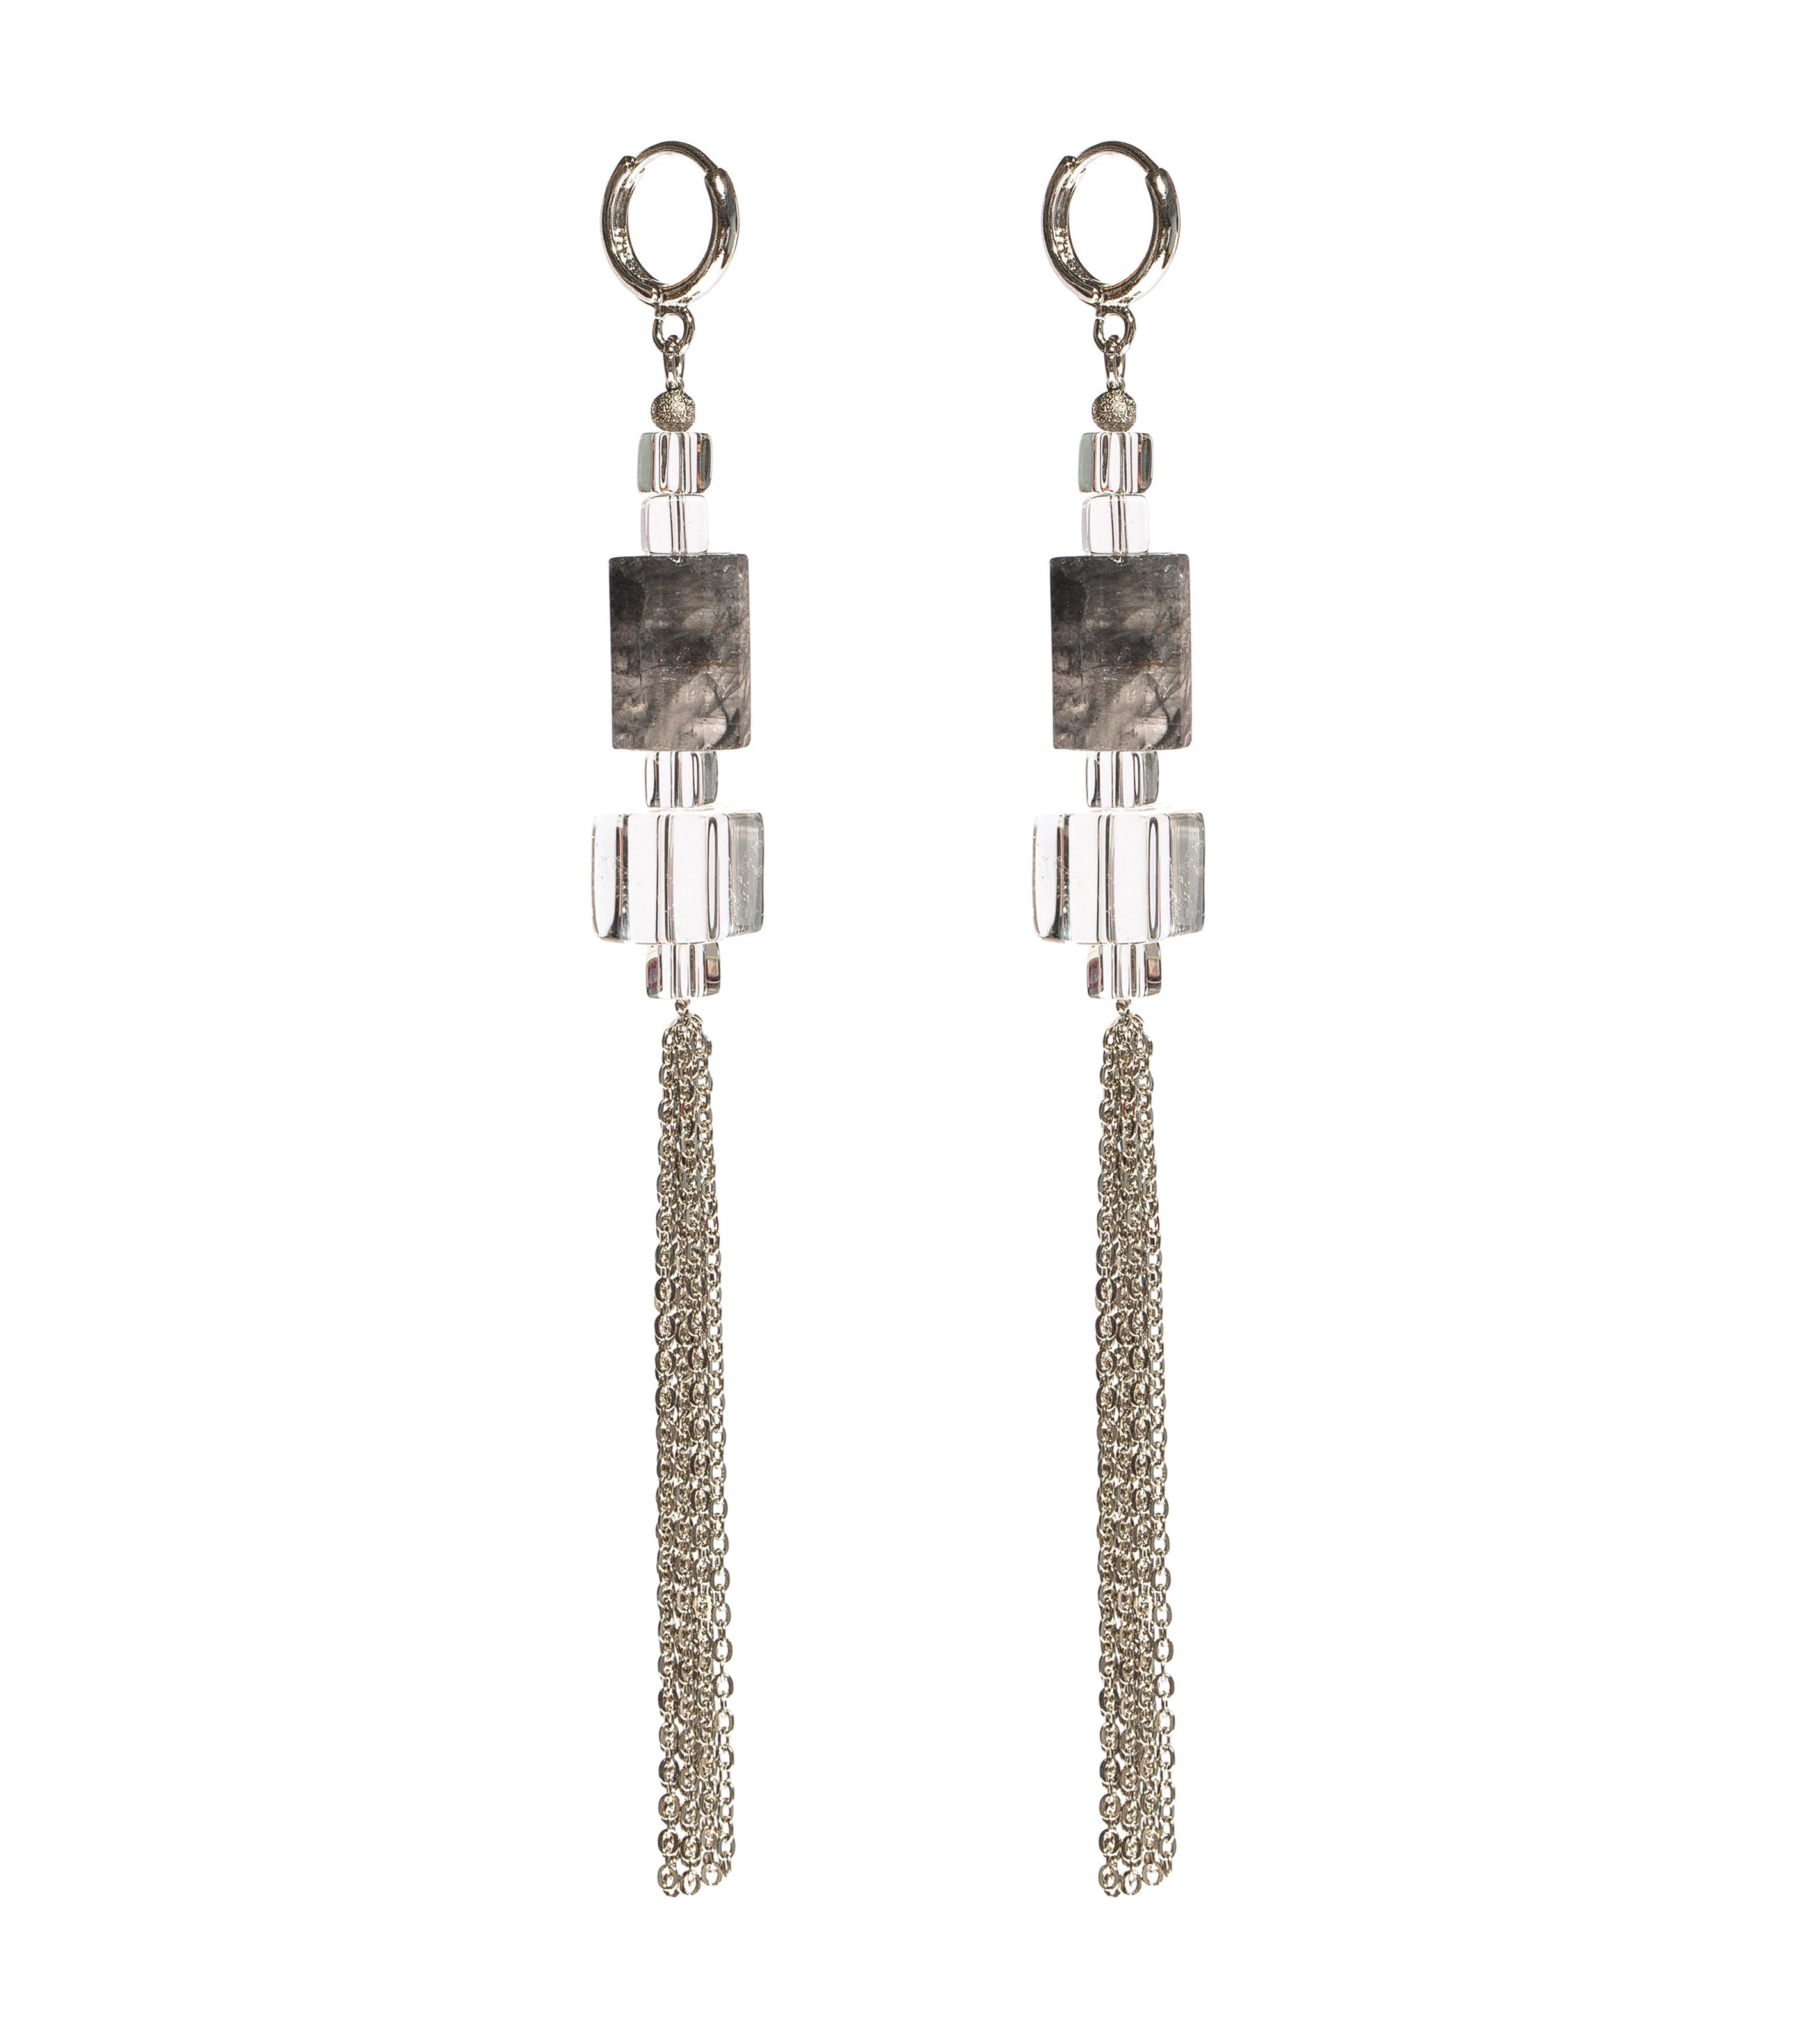 017-selena-earrings-golovina-accessories-01